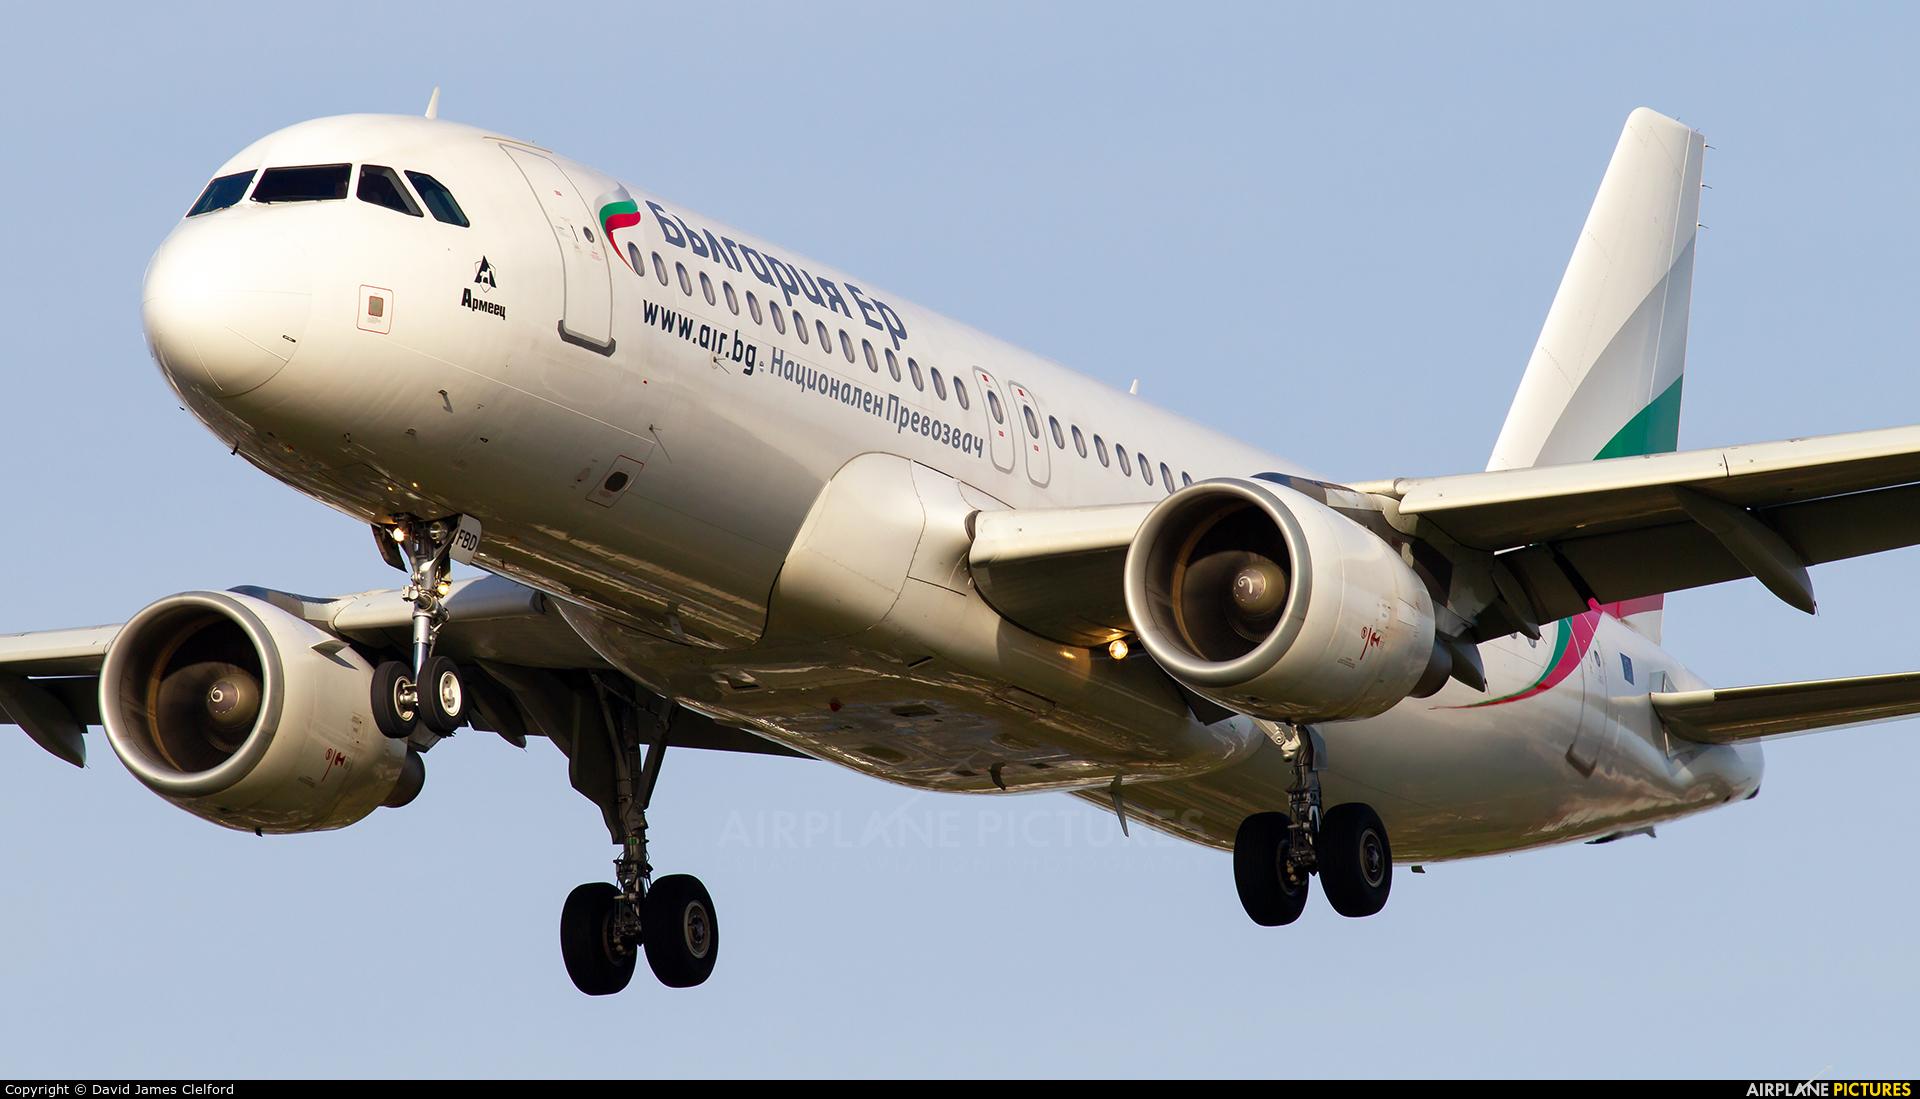 Bulgaria Air LZ-FBD aircraft at London - Heathrow